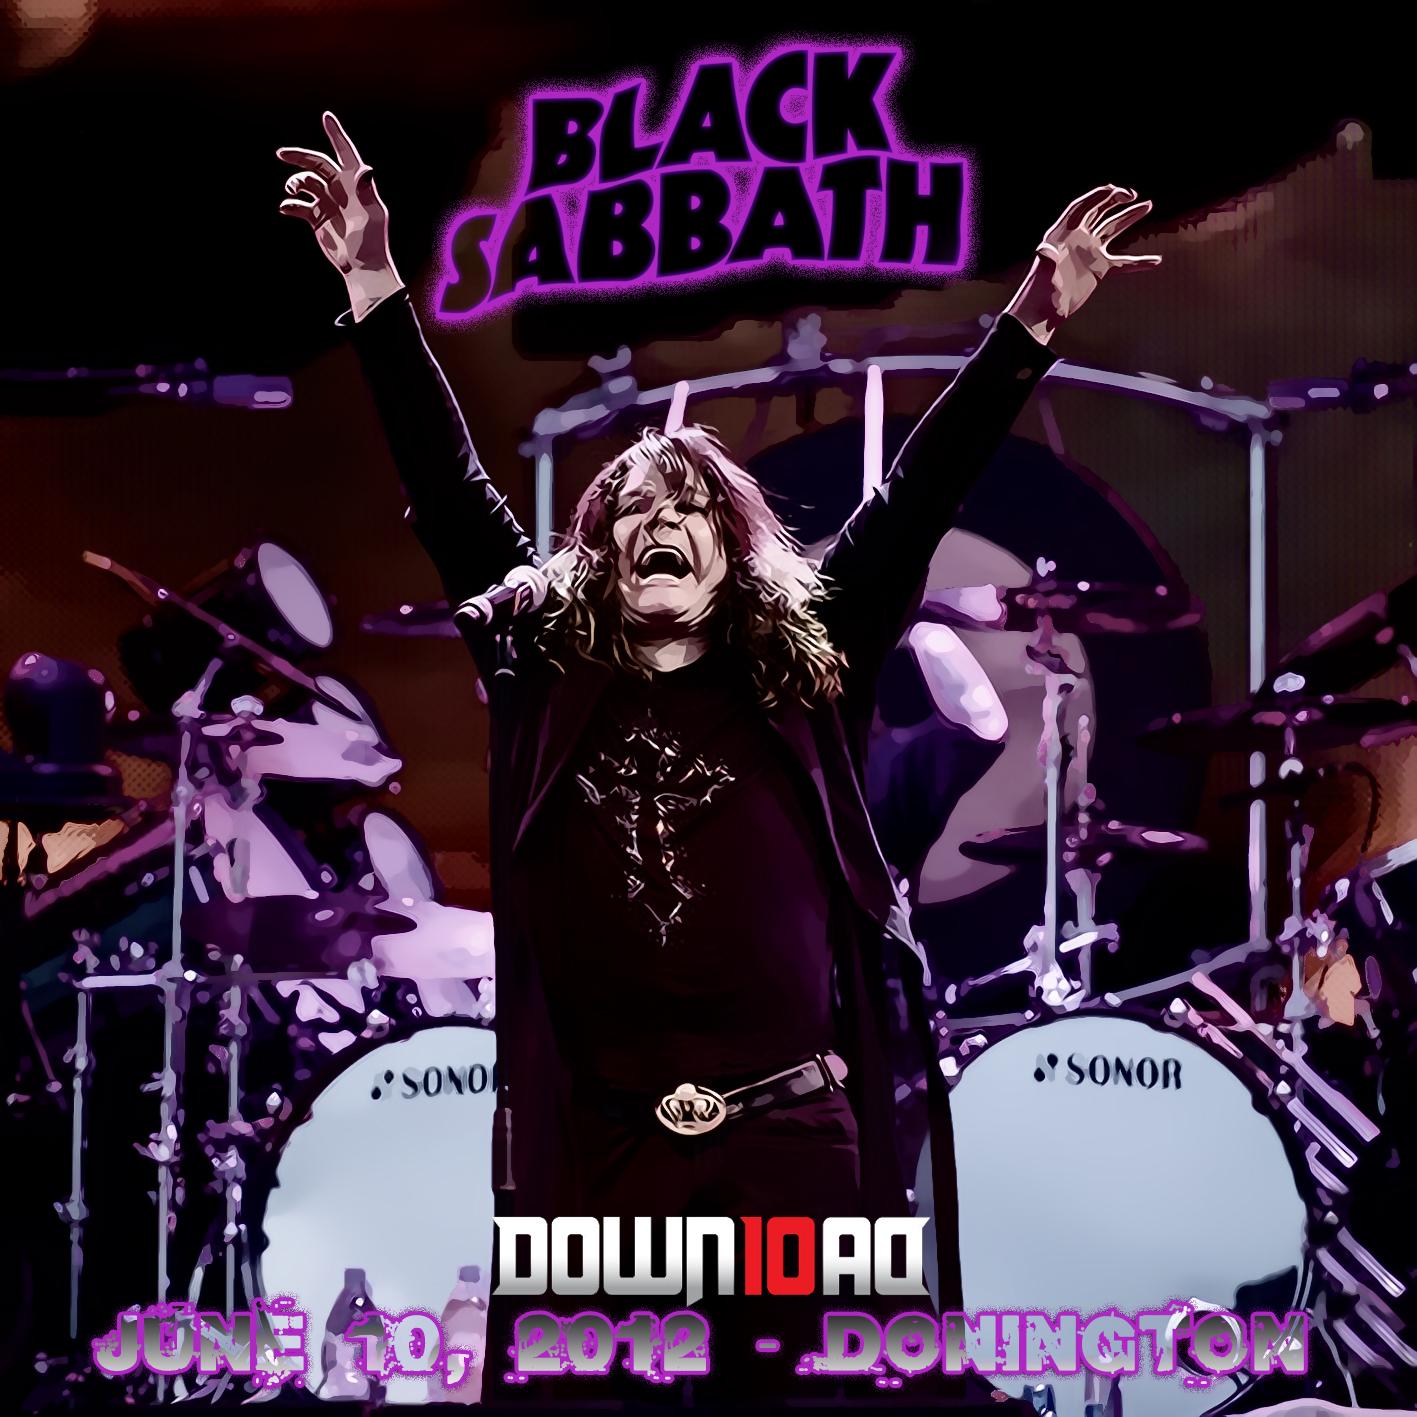 HEAVY-ROCK BOOTLEGS: Black sabbath:2012-06-10-Download